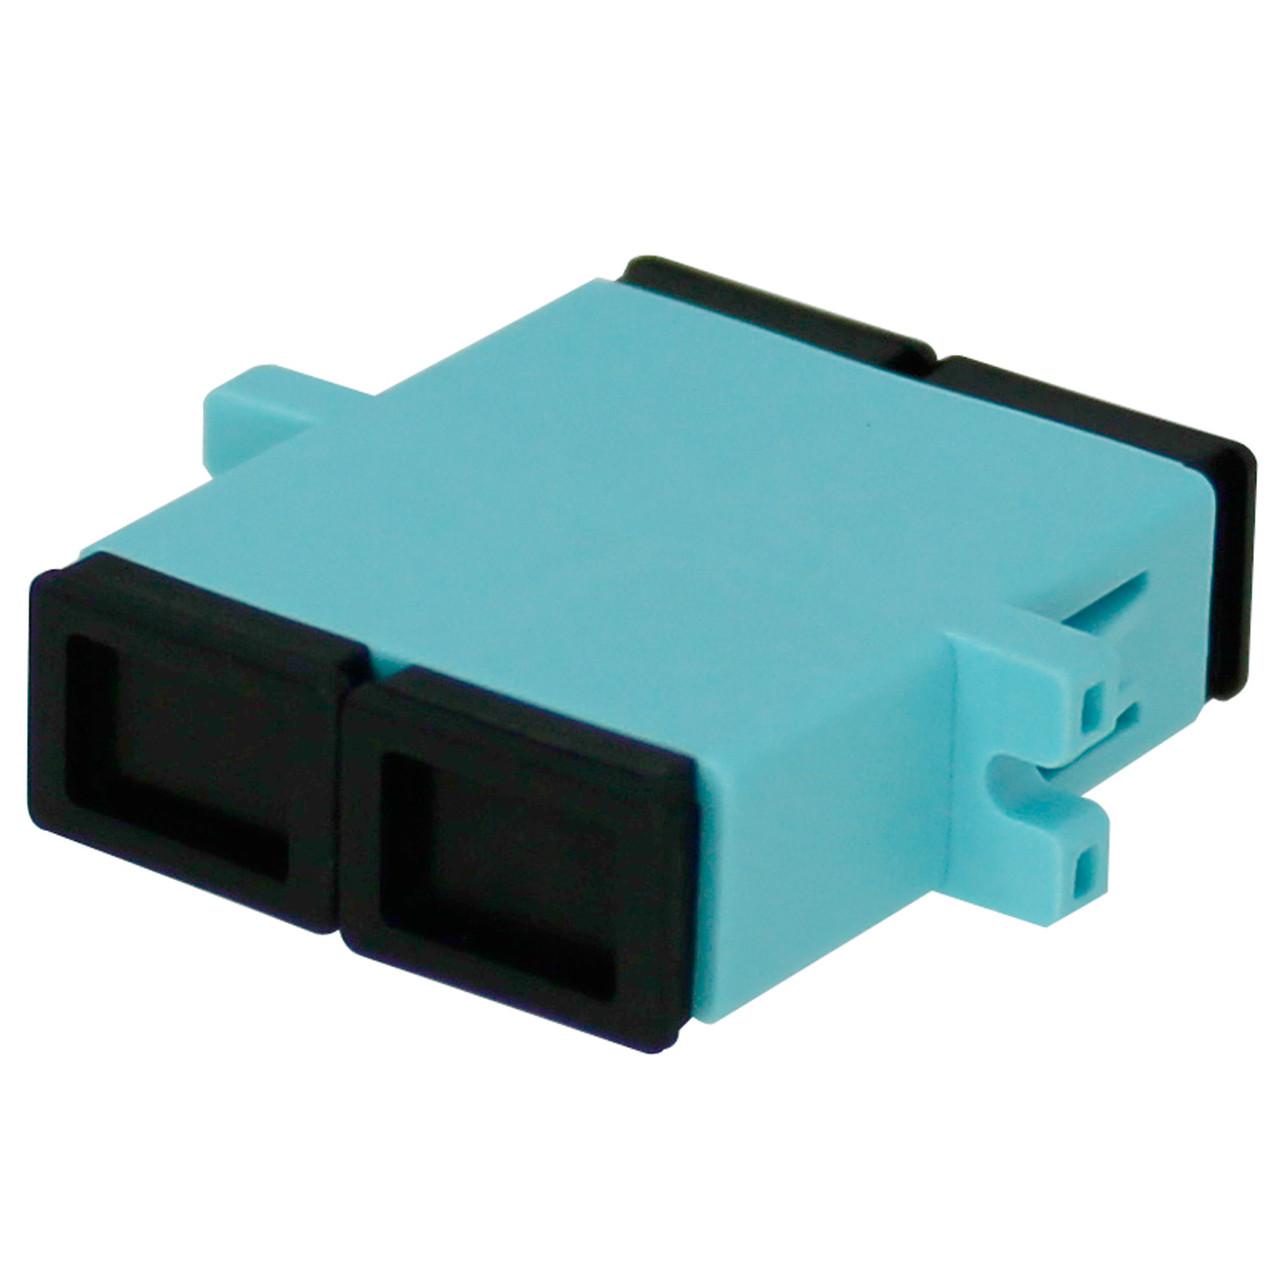 CPL-SCSC-DM-10G SC to SC Fiber Coupler, Duplex, Multimode, 10G OM3,  P B (Phosphor Bronze) Sleeve